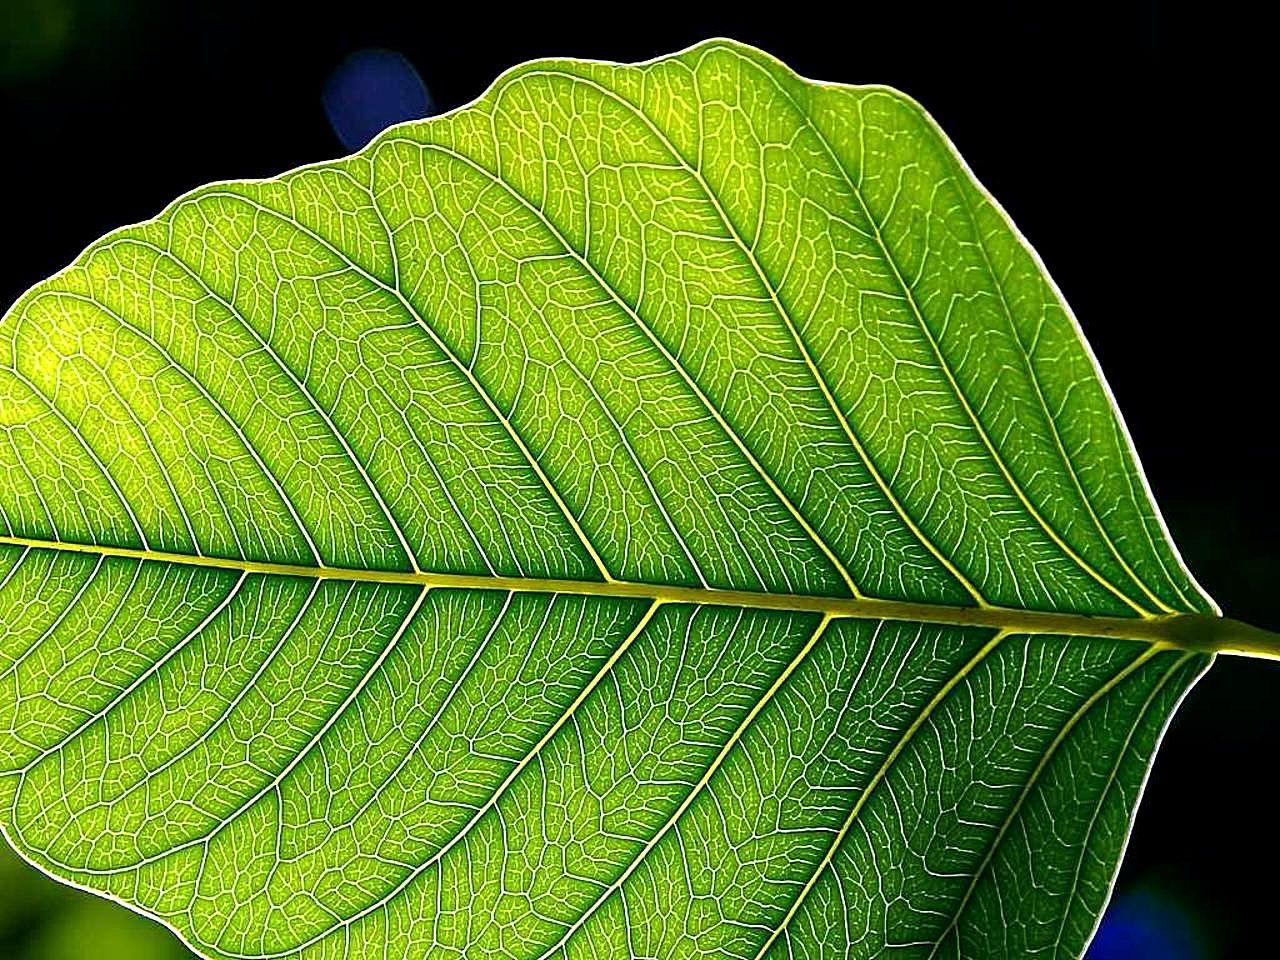 Falling Money Wallpaper Hd Free Leaves Download Free Clip Art Free Clip Art On